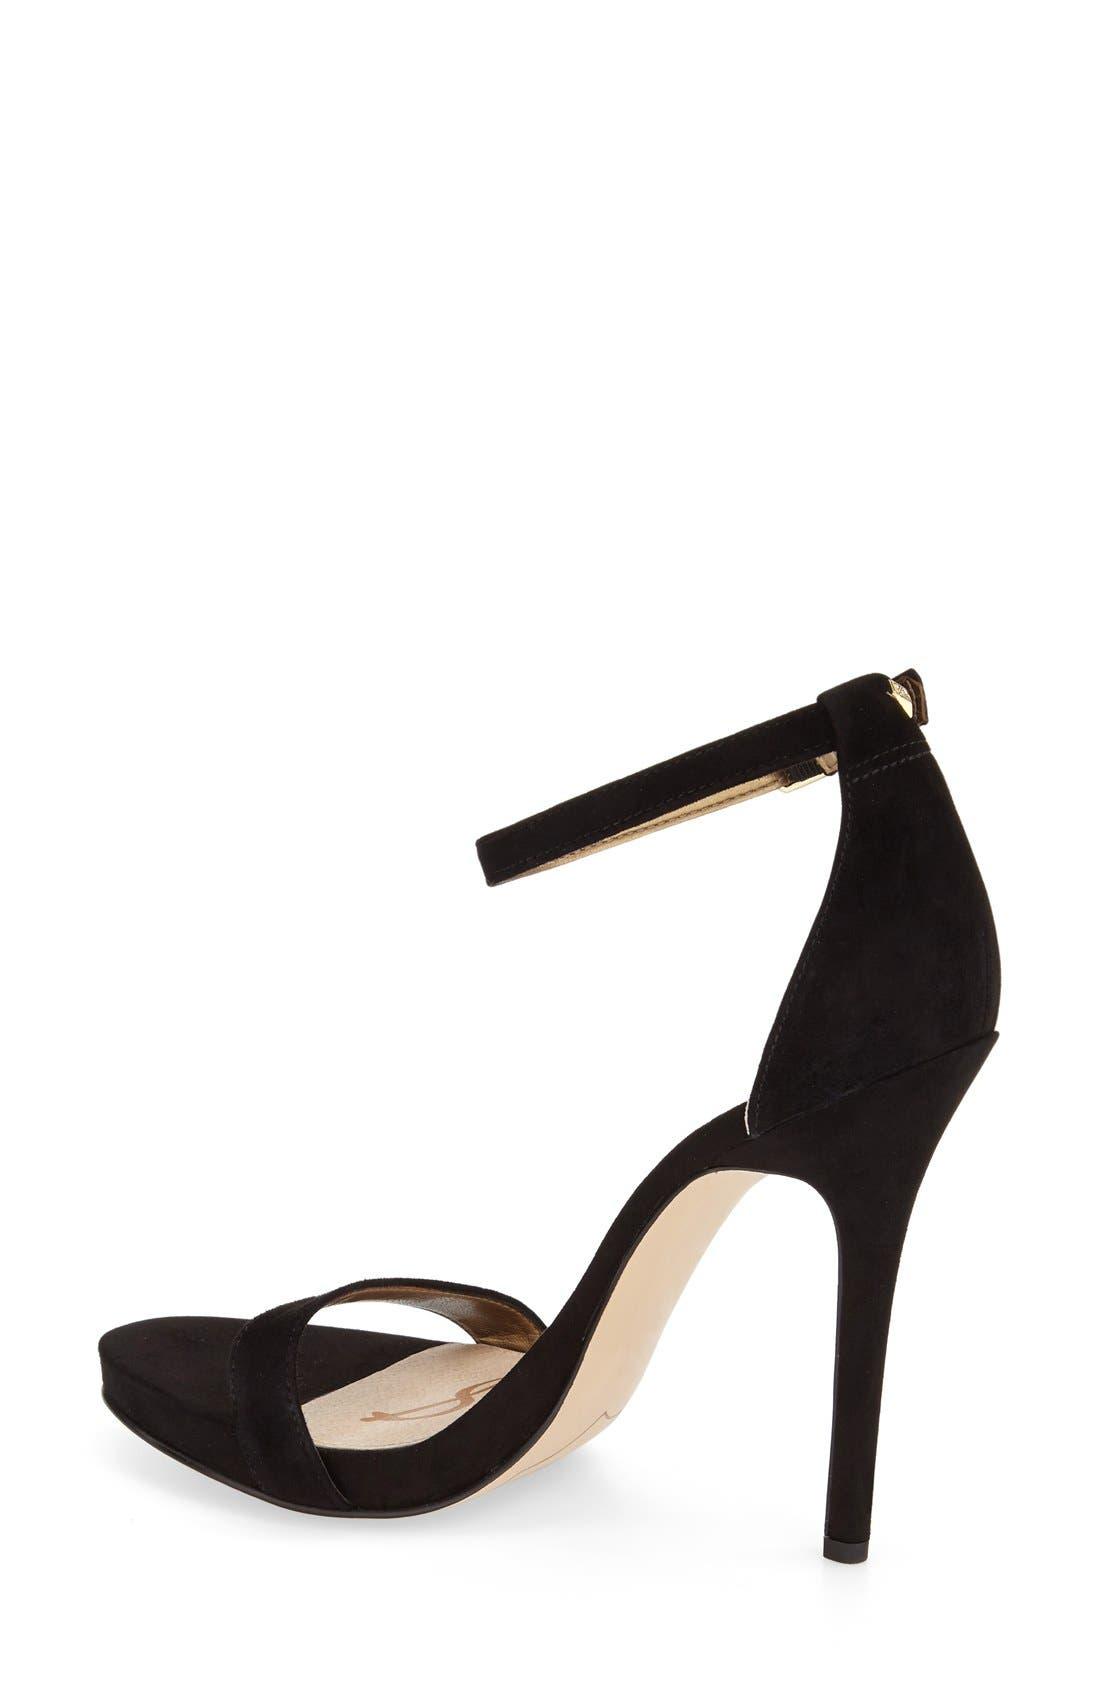 ,                             'Eleanor' Ankle Strap Sandal,                             Alternate thumbnail 22, color,                             003